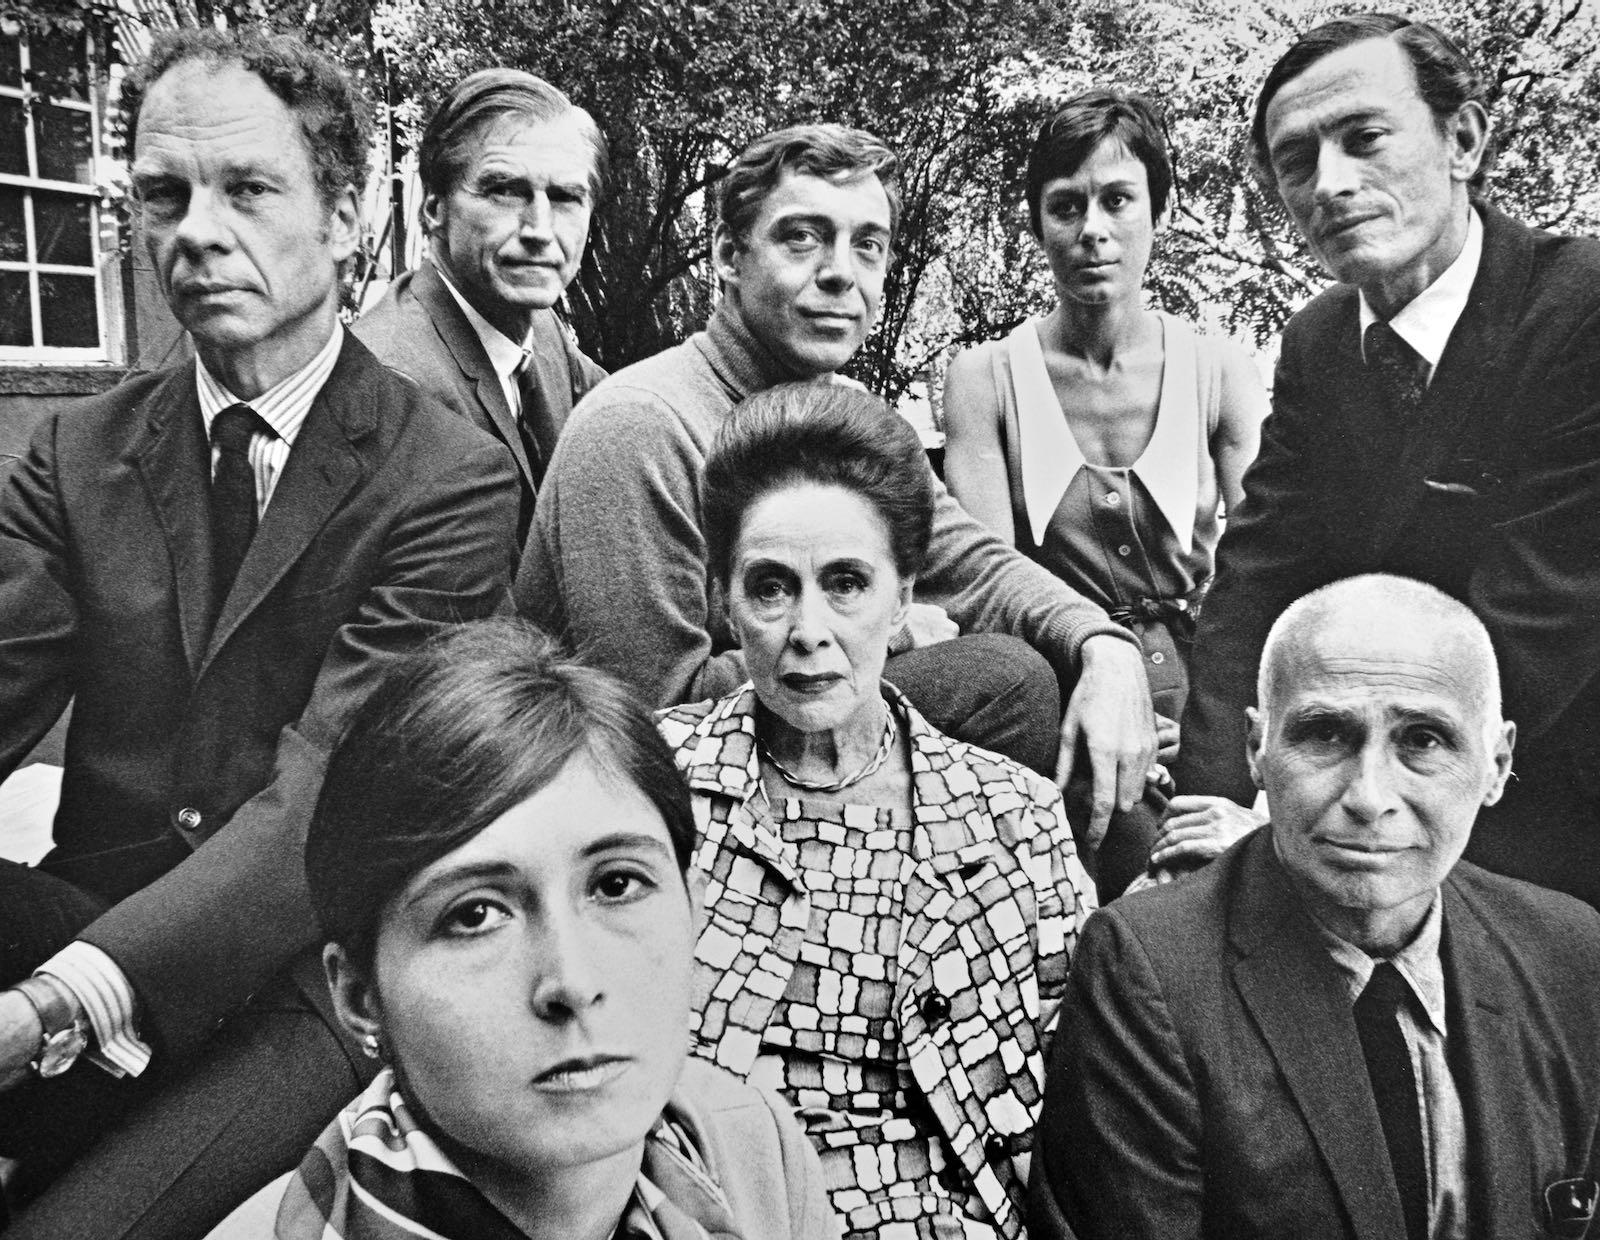 The choreographers Merce Cunningham, Twyla Tharp, Erick Hawkins, Paul Taylor, Martha Graham, Yvonne Rainer, José Limón, and Don Redlich, on the terrace of Graham's Manhattan home, New York City, 1968